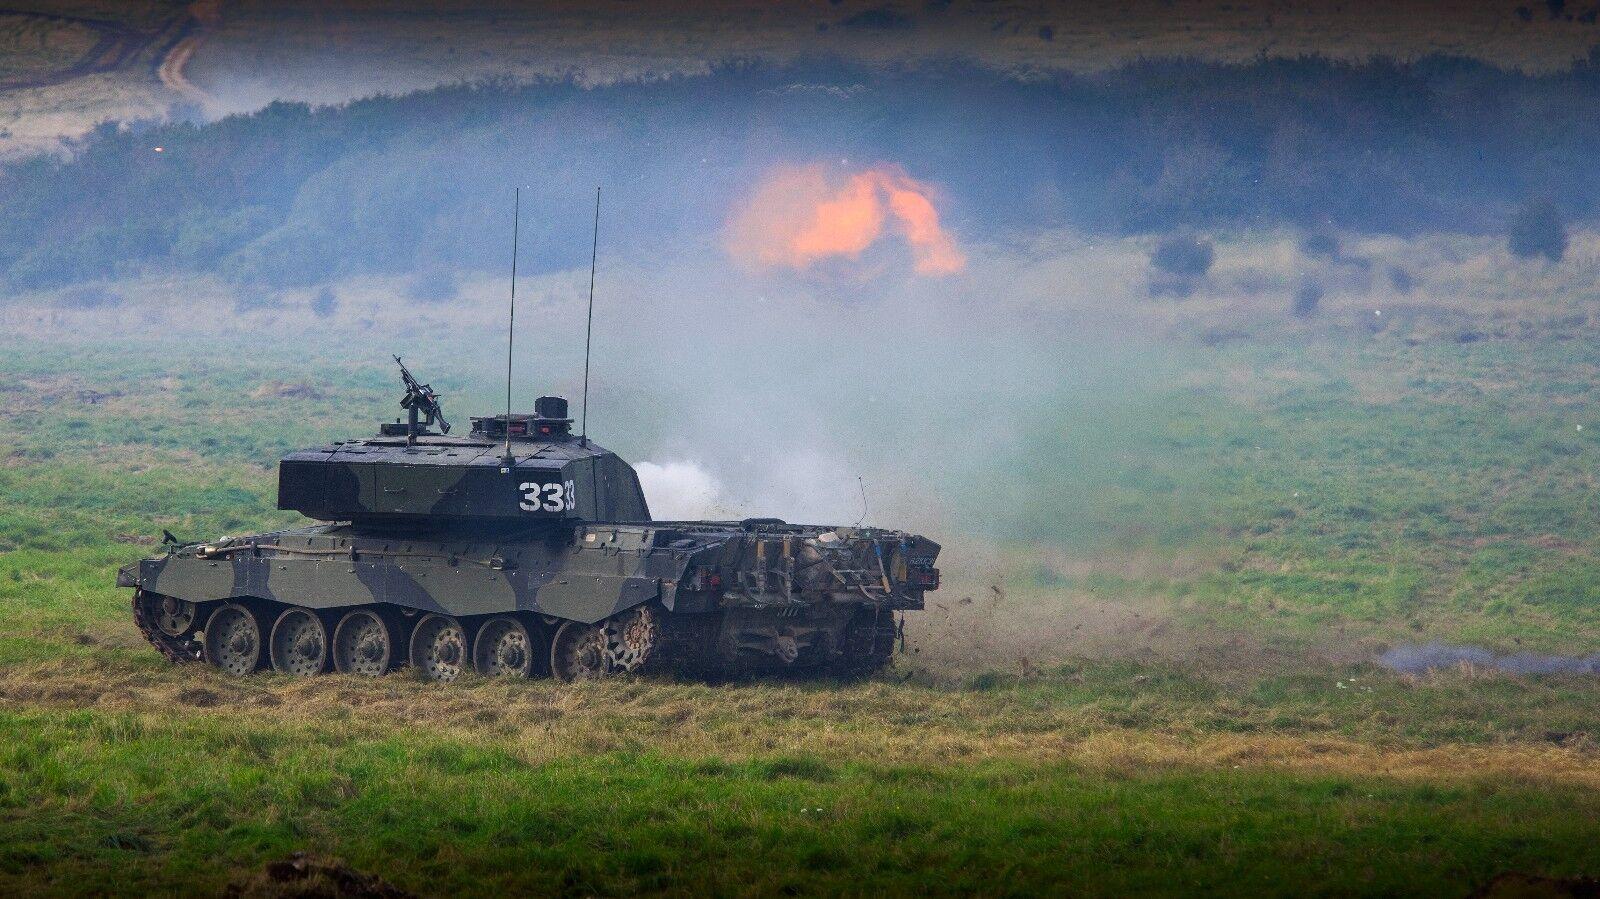 BRITISH ARMY CHALLENGER 2 MAIN BATTLE TANK    MILITARY Photo Print